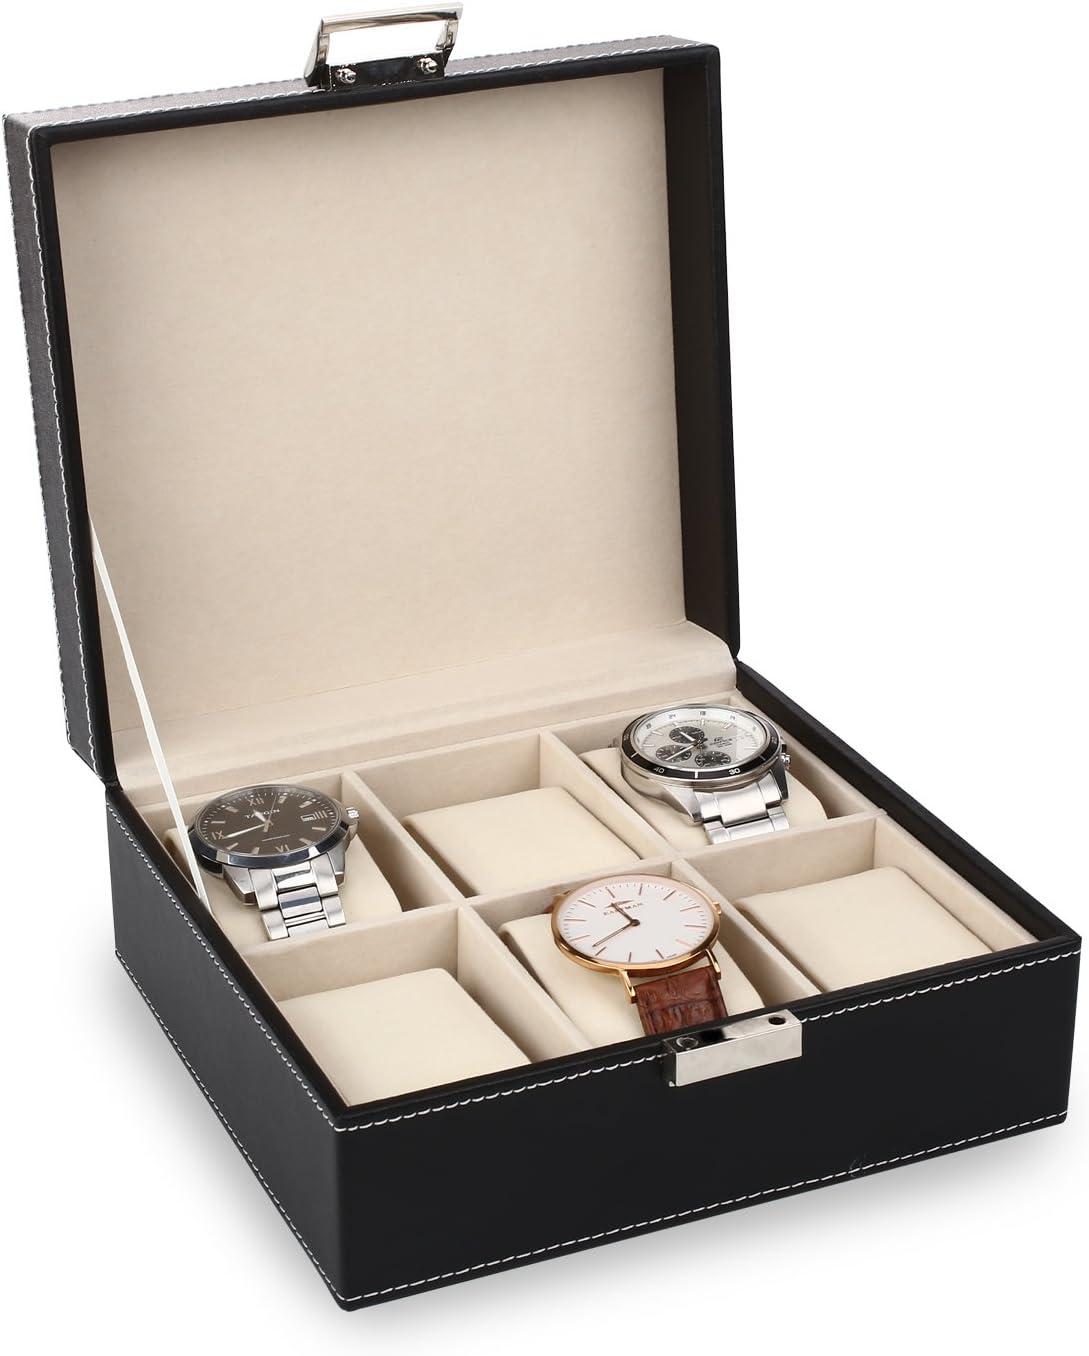 Amzdeal caja para relojes, para 6 relojes, para proteger los ...